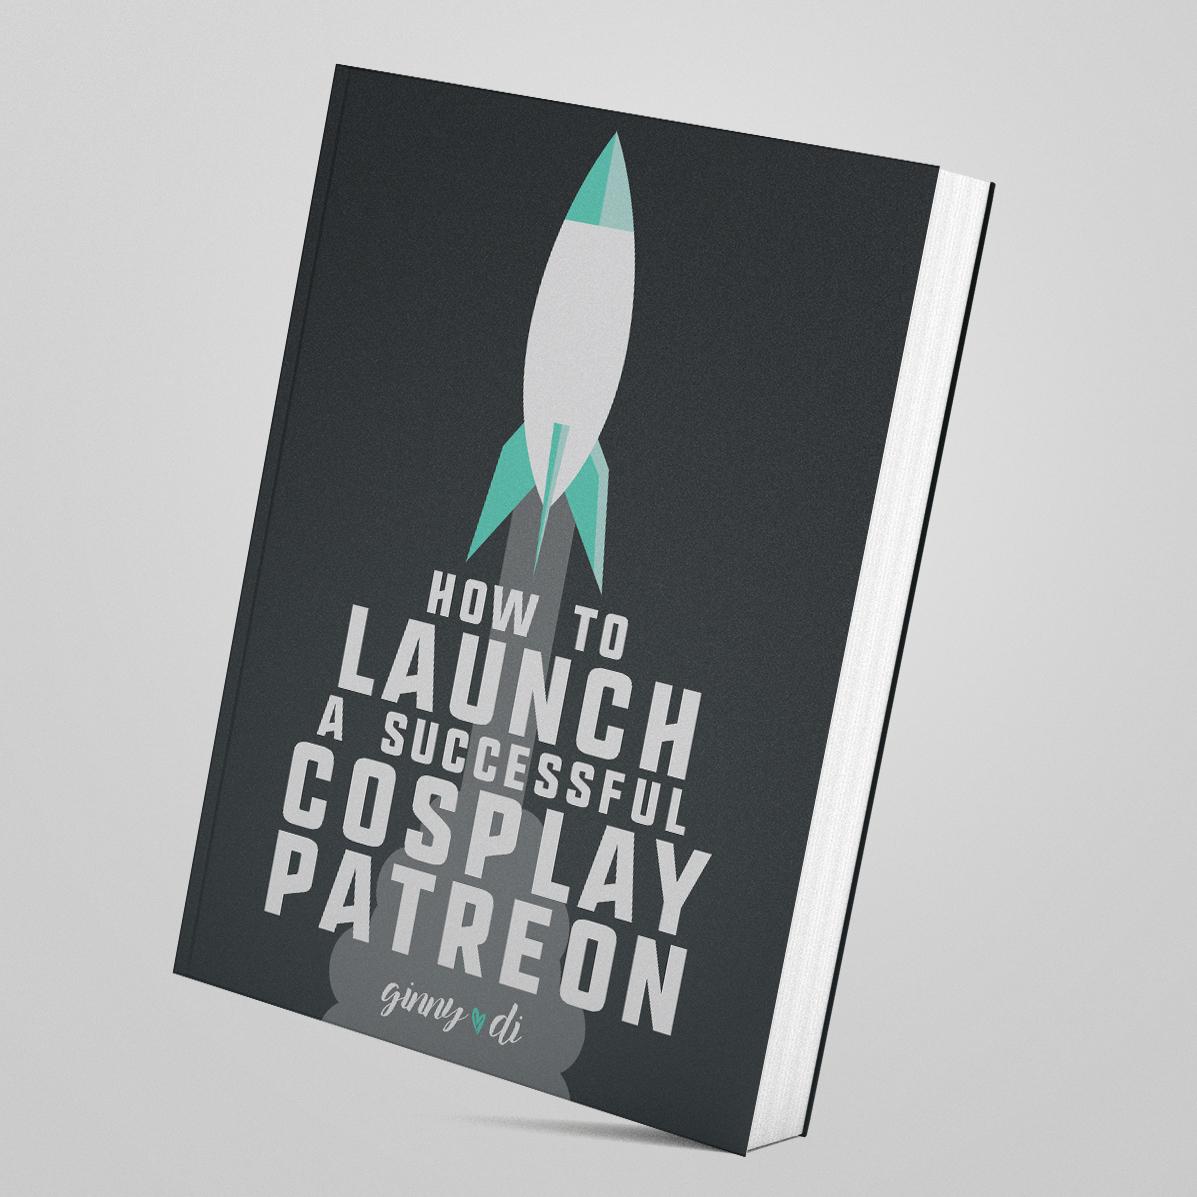 cosplay patreon ebook mockup square.jpg